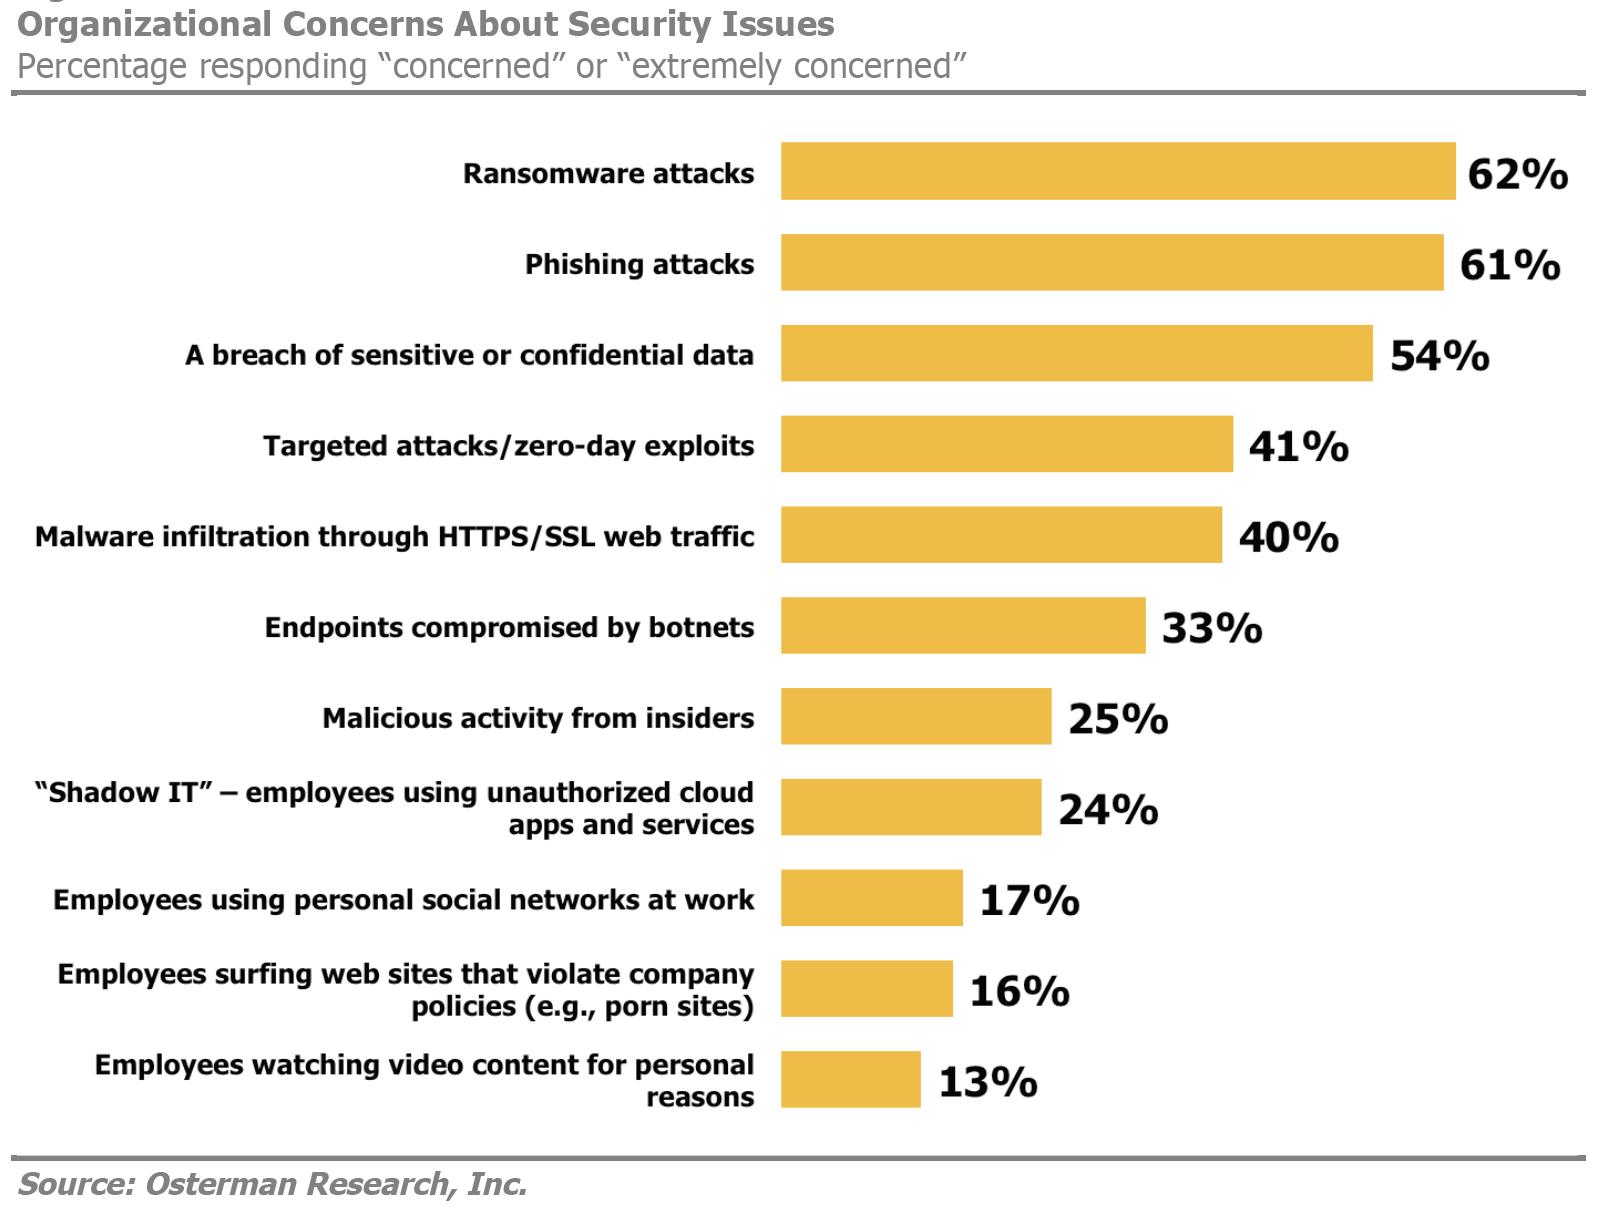 Current security concerns